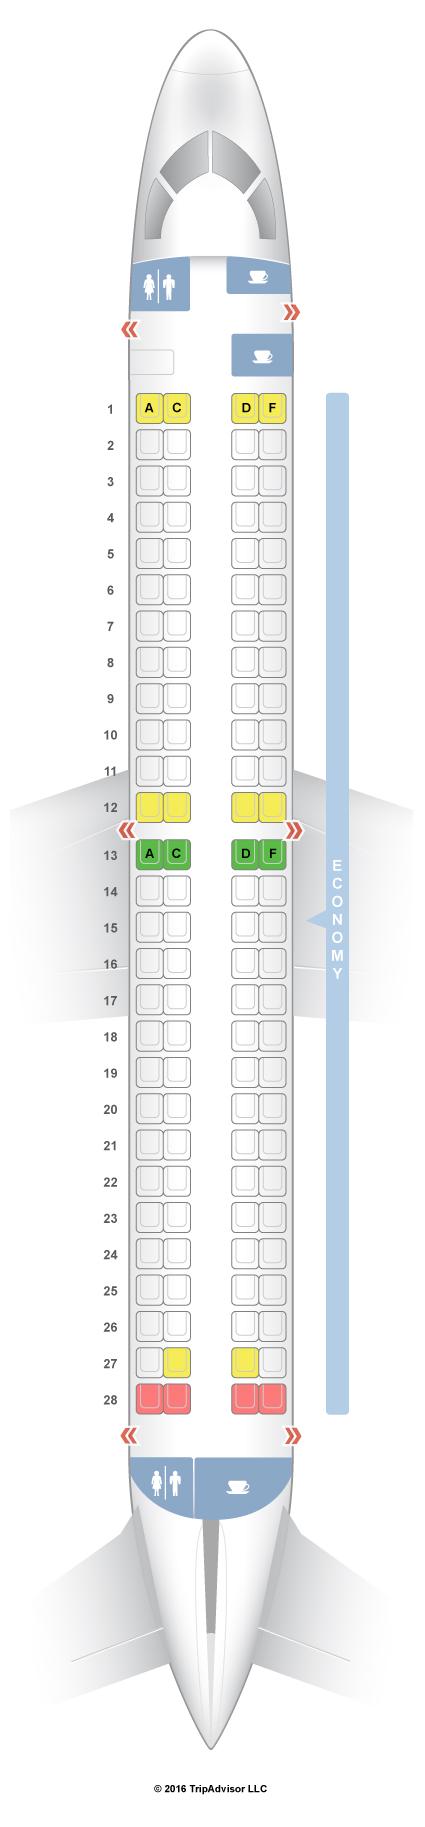 Seatguru Seat Map Swiss Embraer 190  E90